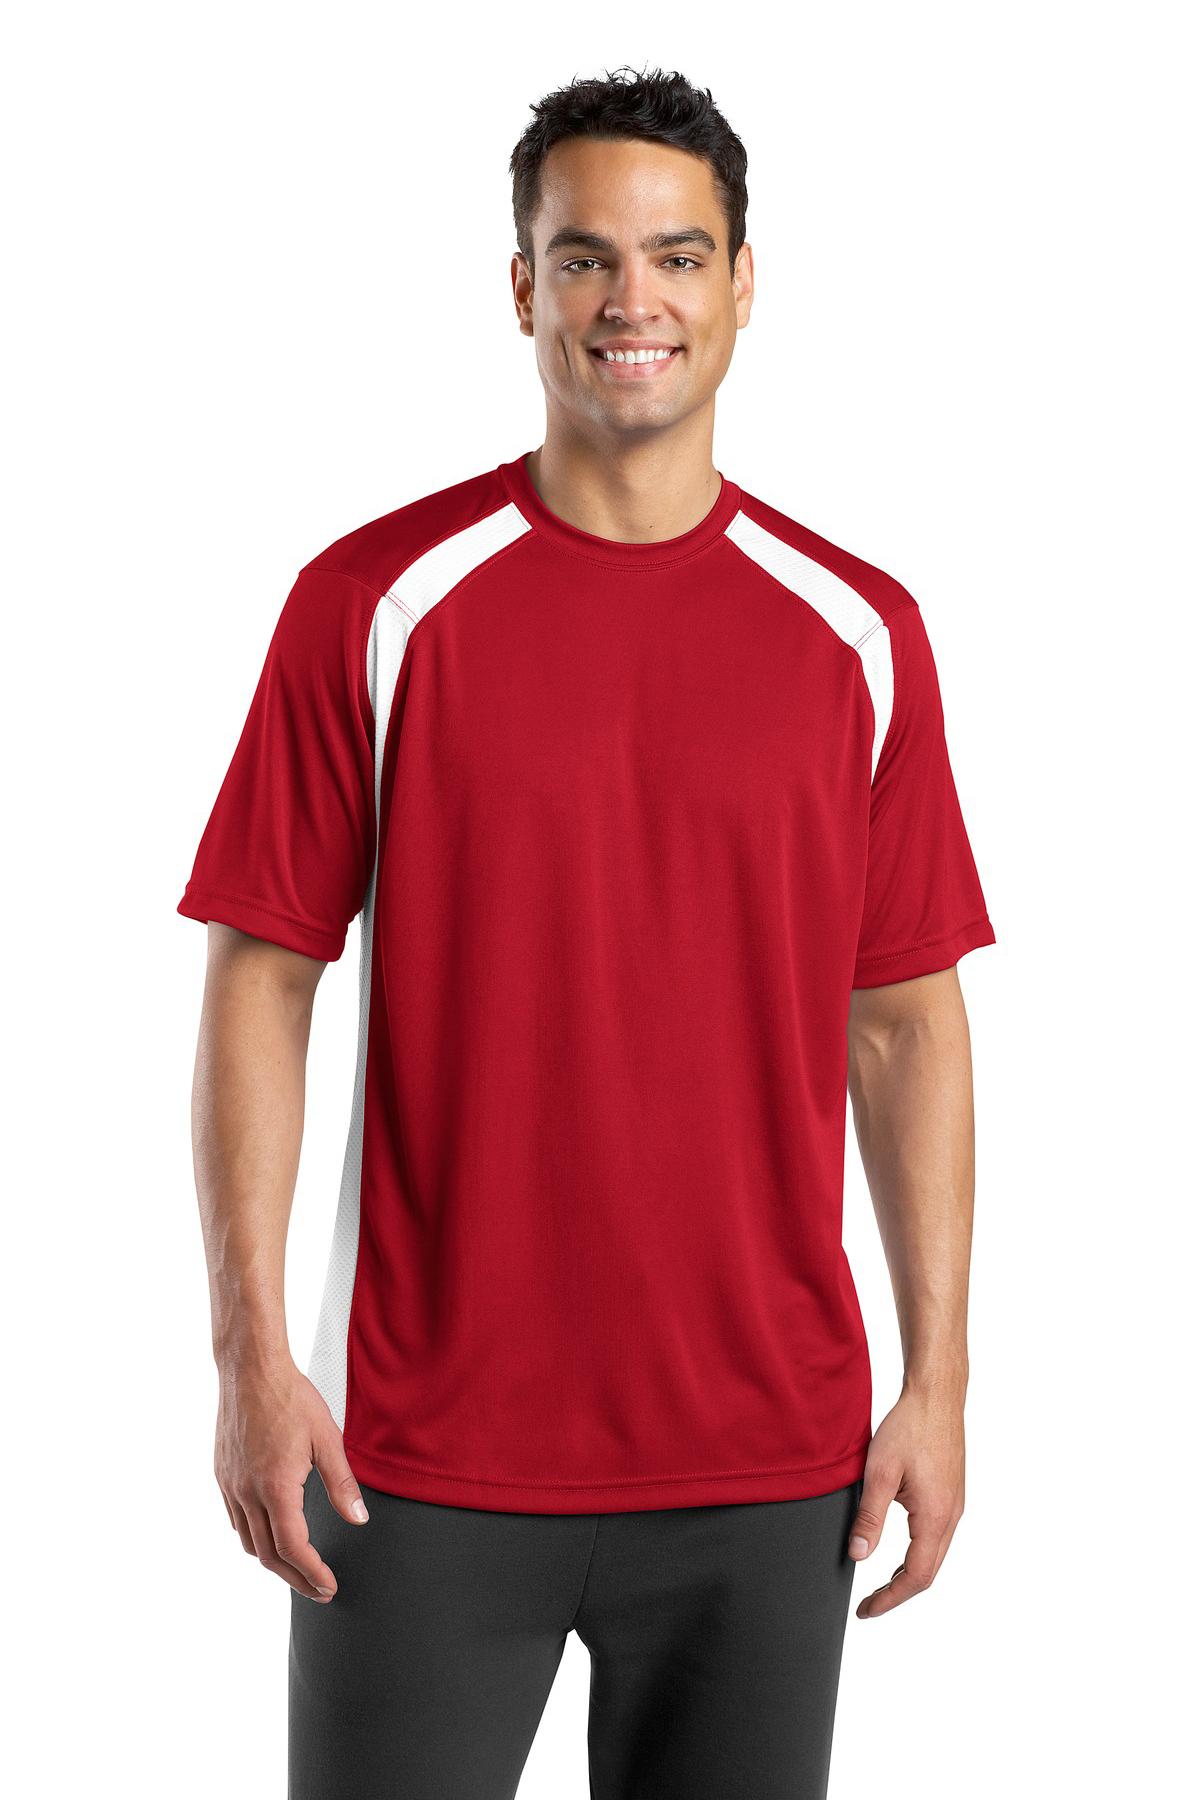 T-Shirts-Performance-39